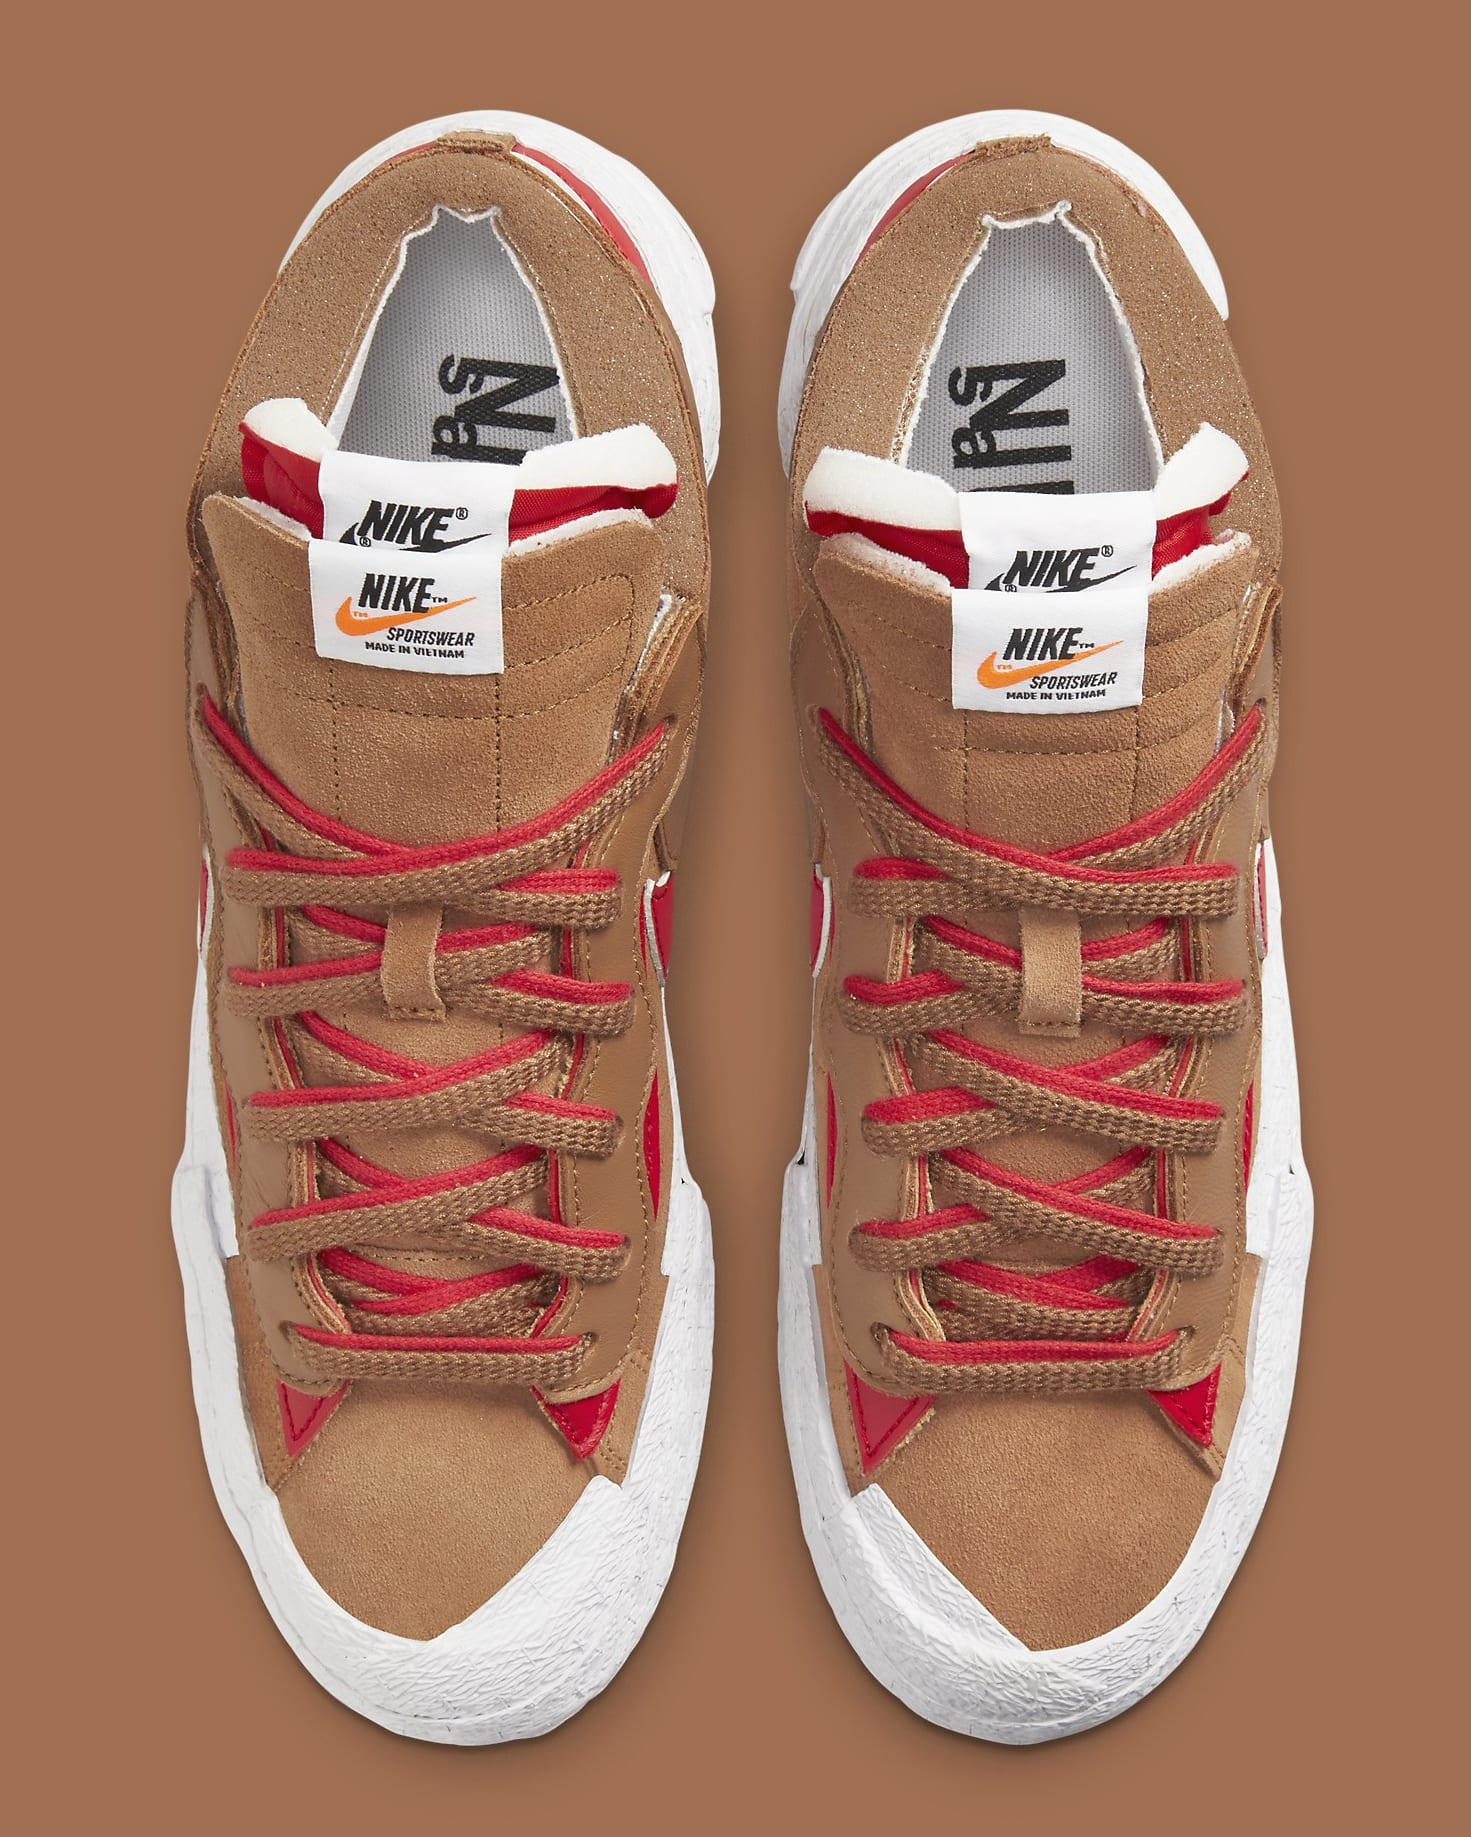 Sacai x Nike Blazer Low 'British Tan' DD1877-200 Top